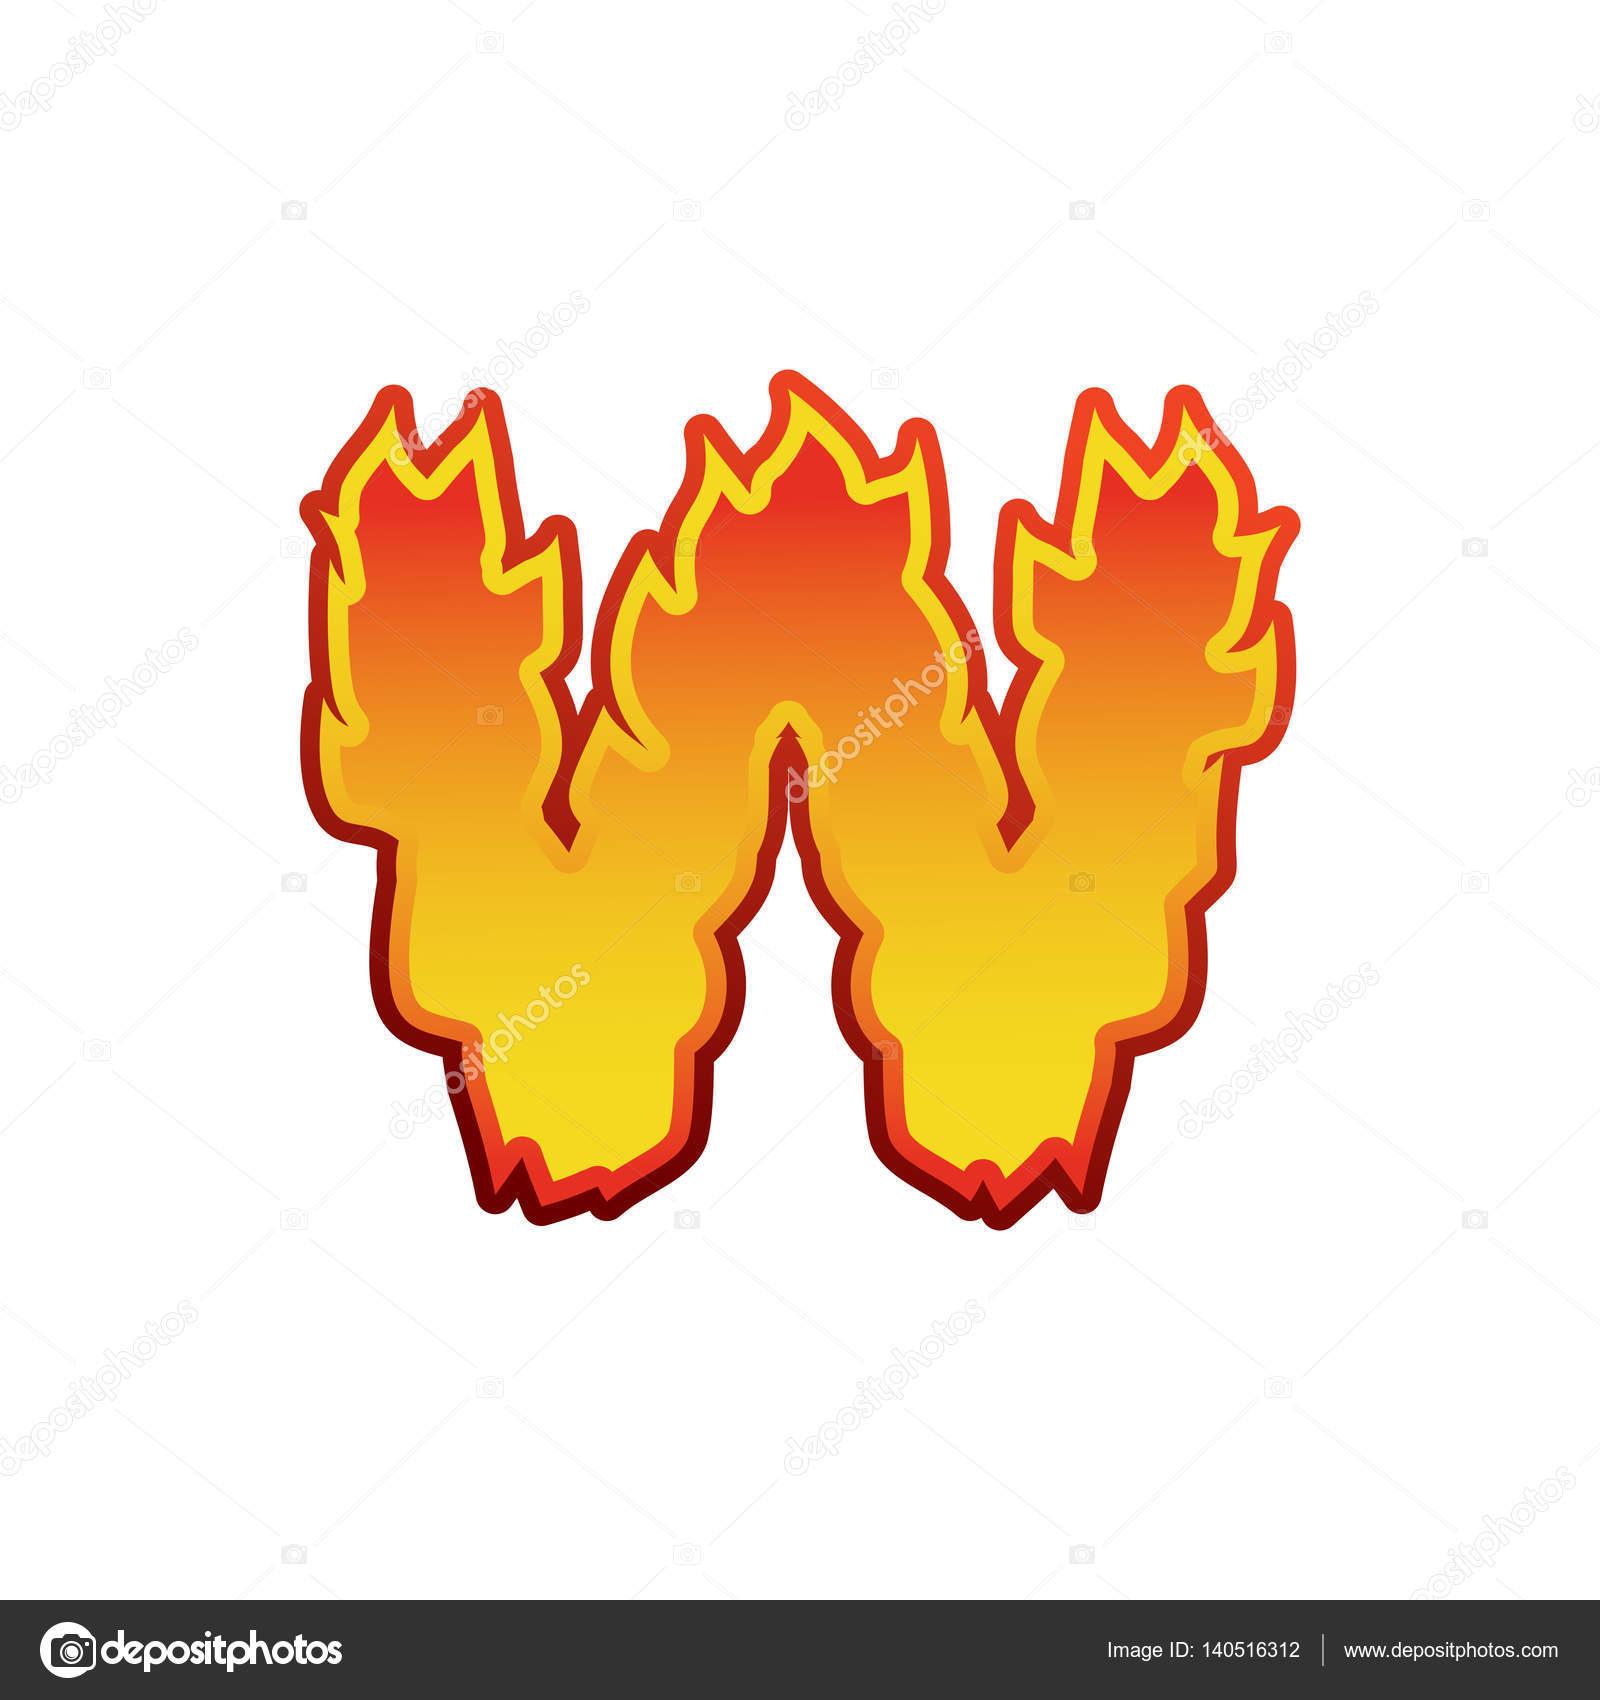 Litera A Ogień Płomienie Czcionki Napisu Tatuaż Znak